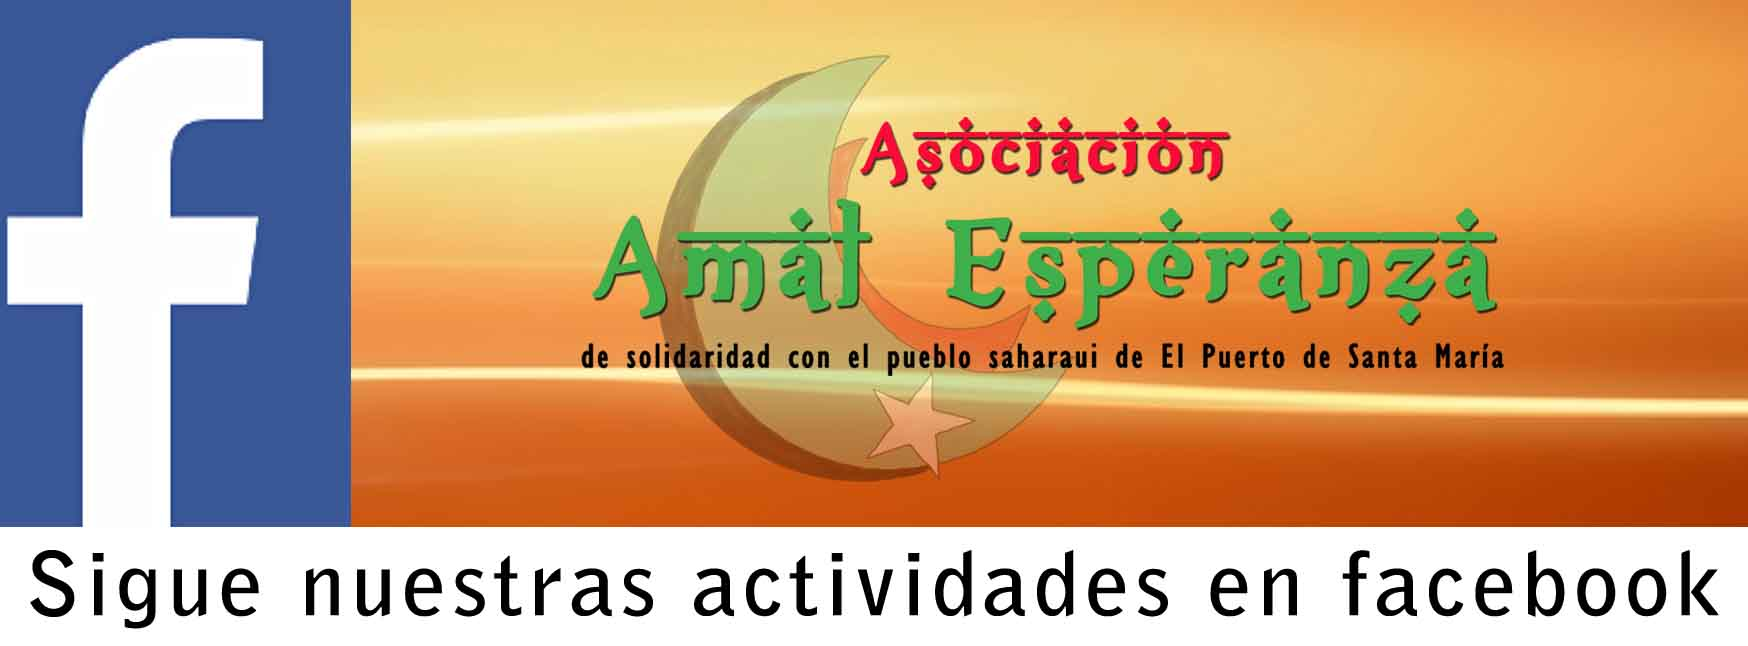 cabecera-amal-facebook